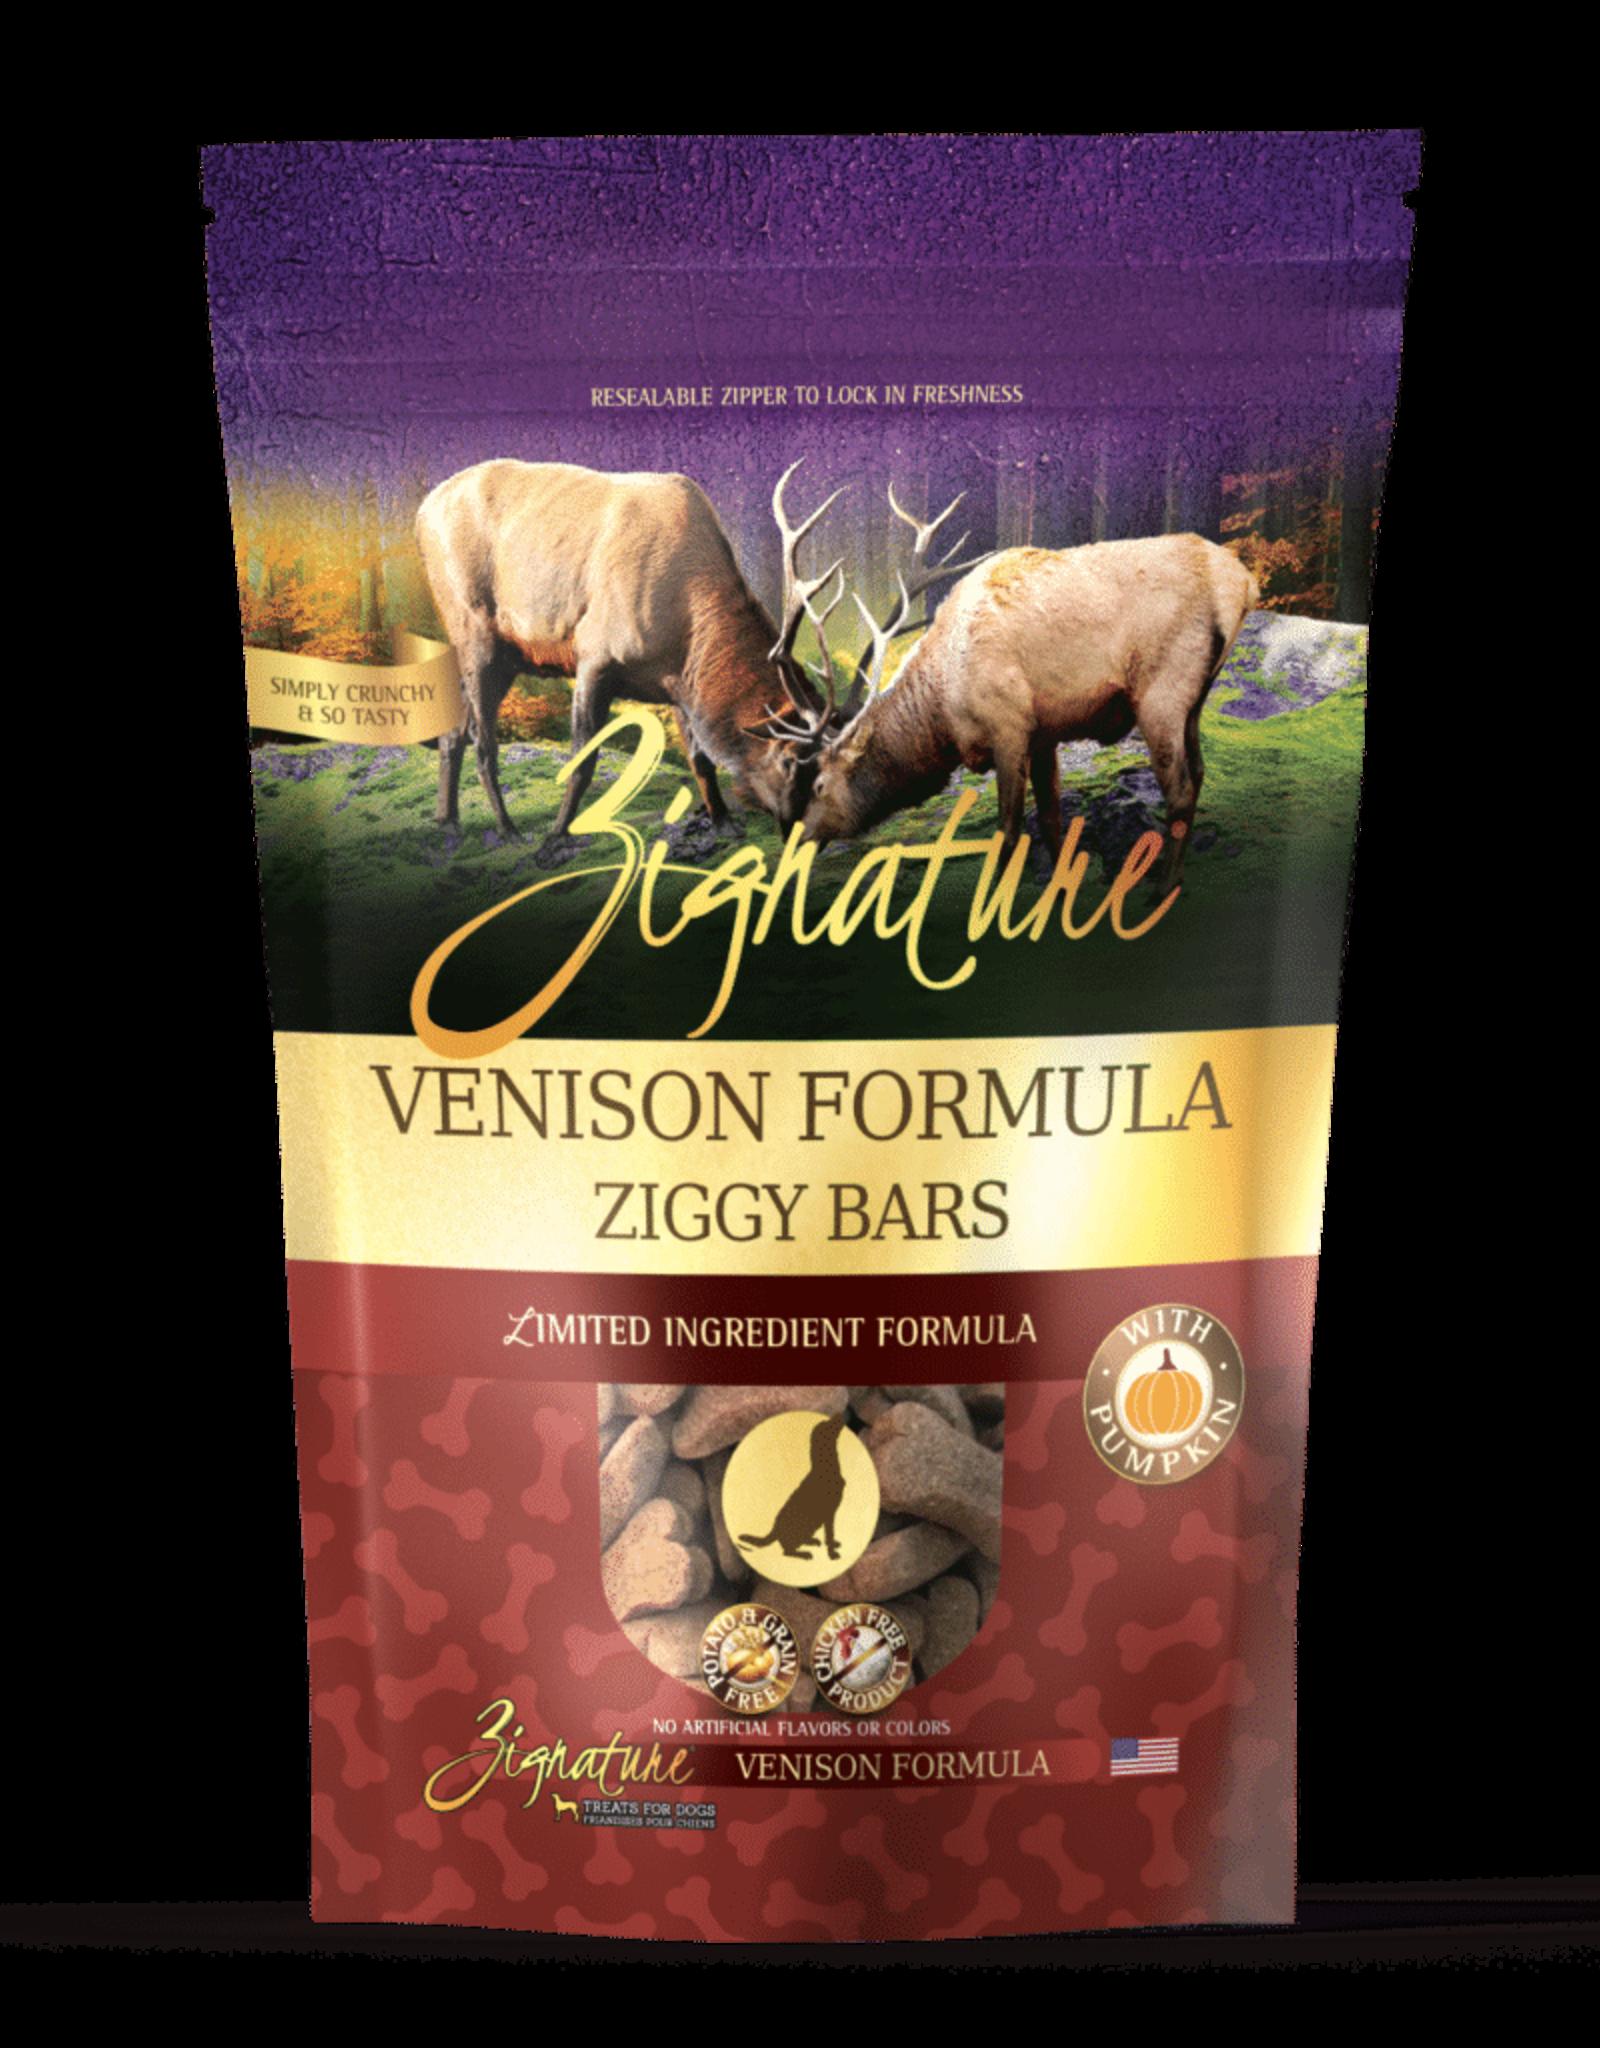 Zignature Ziggy Bar Venison Formula - 12oz